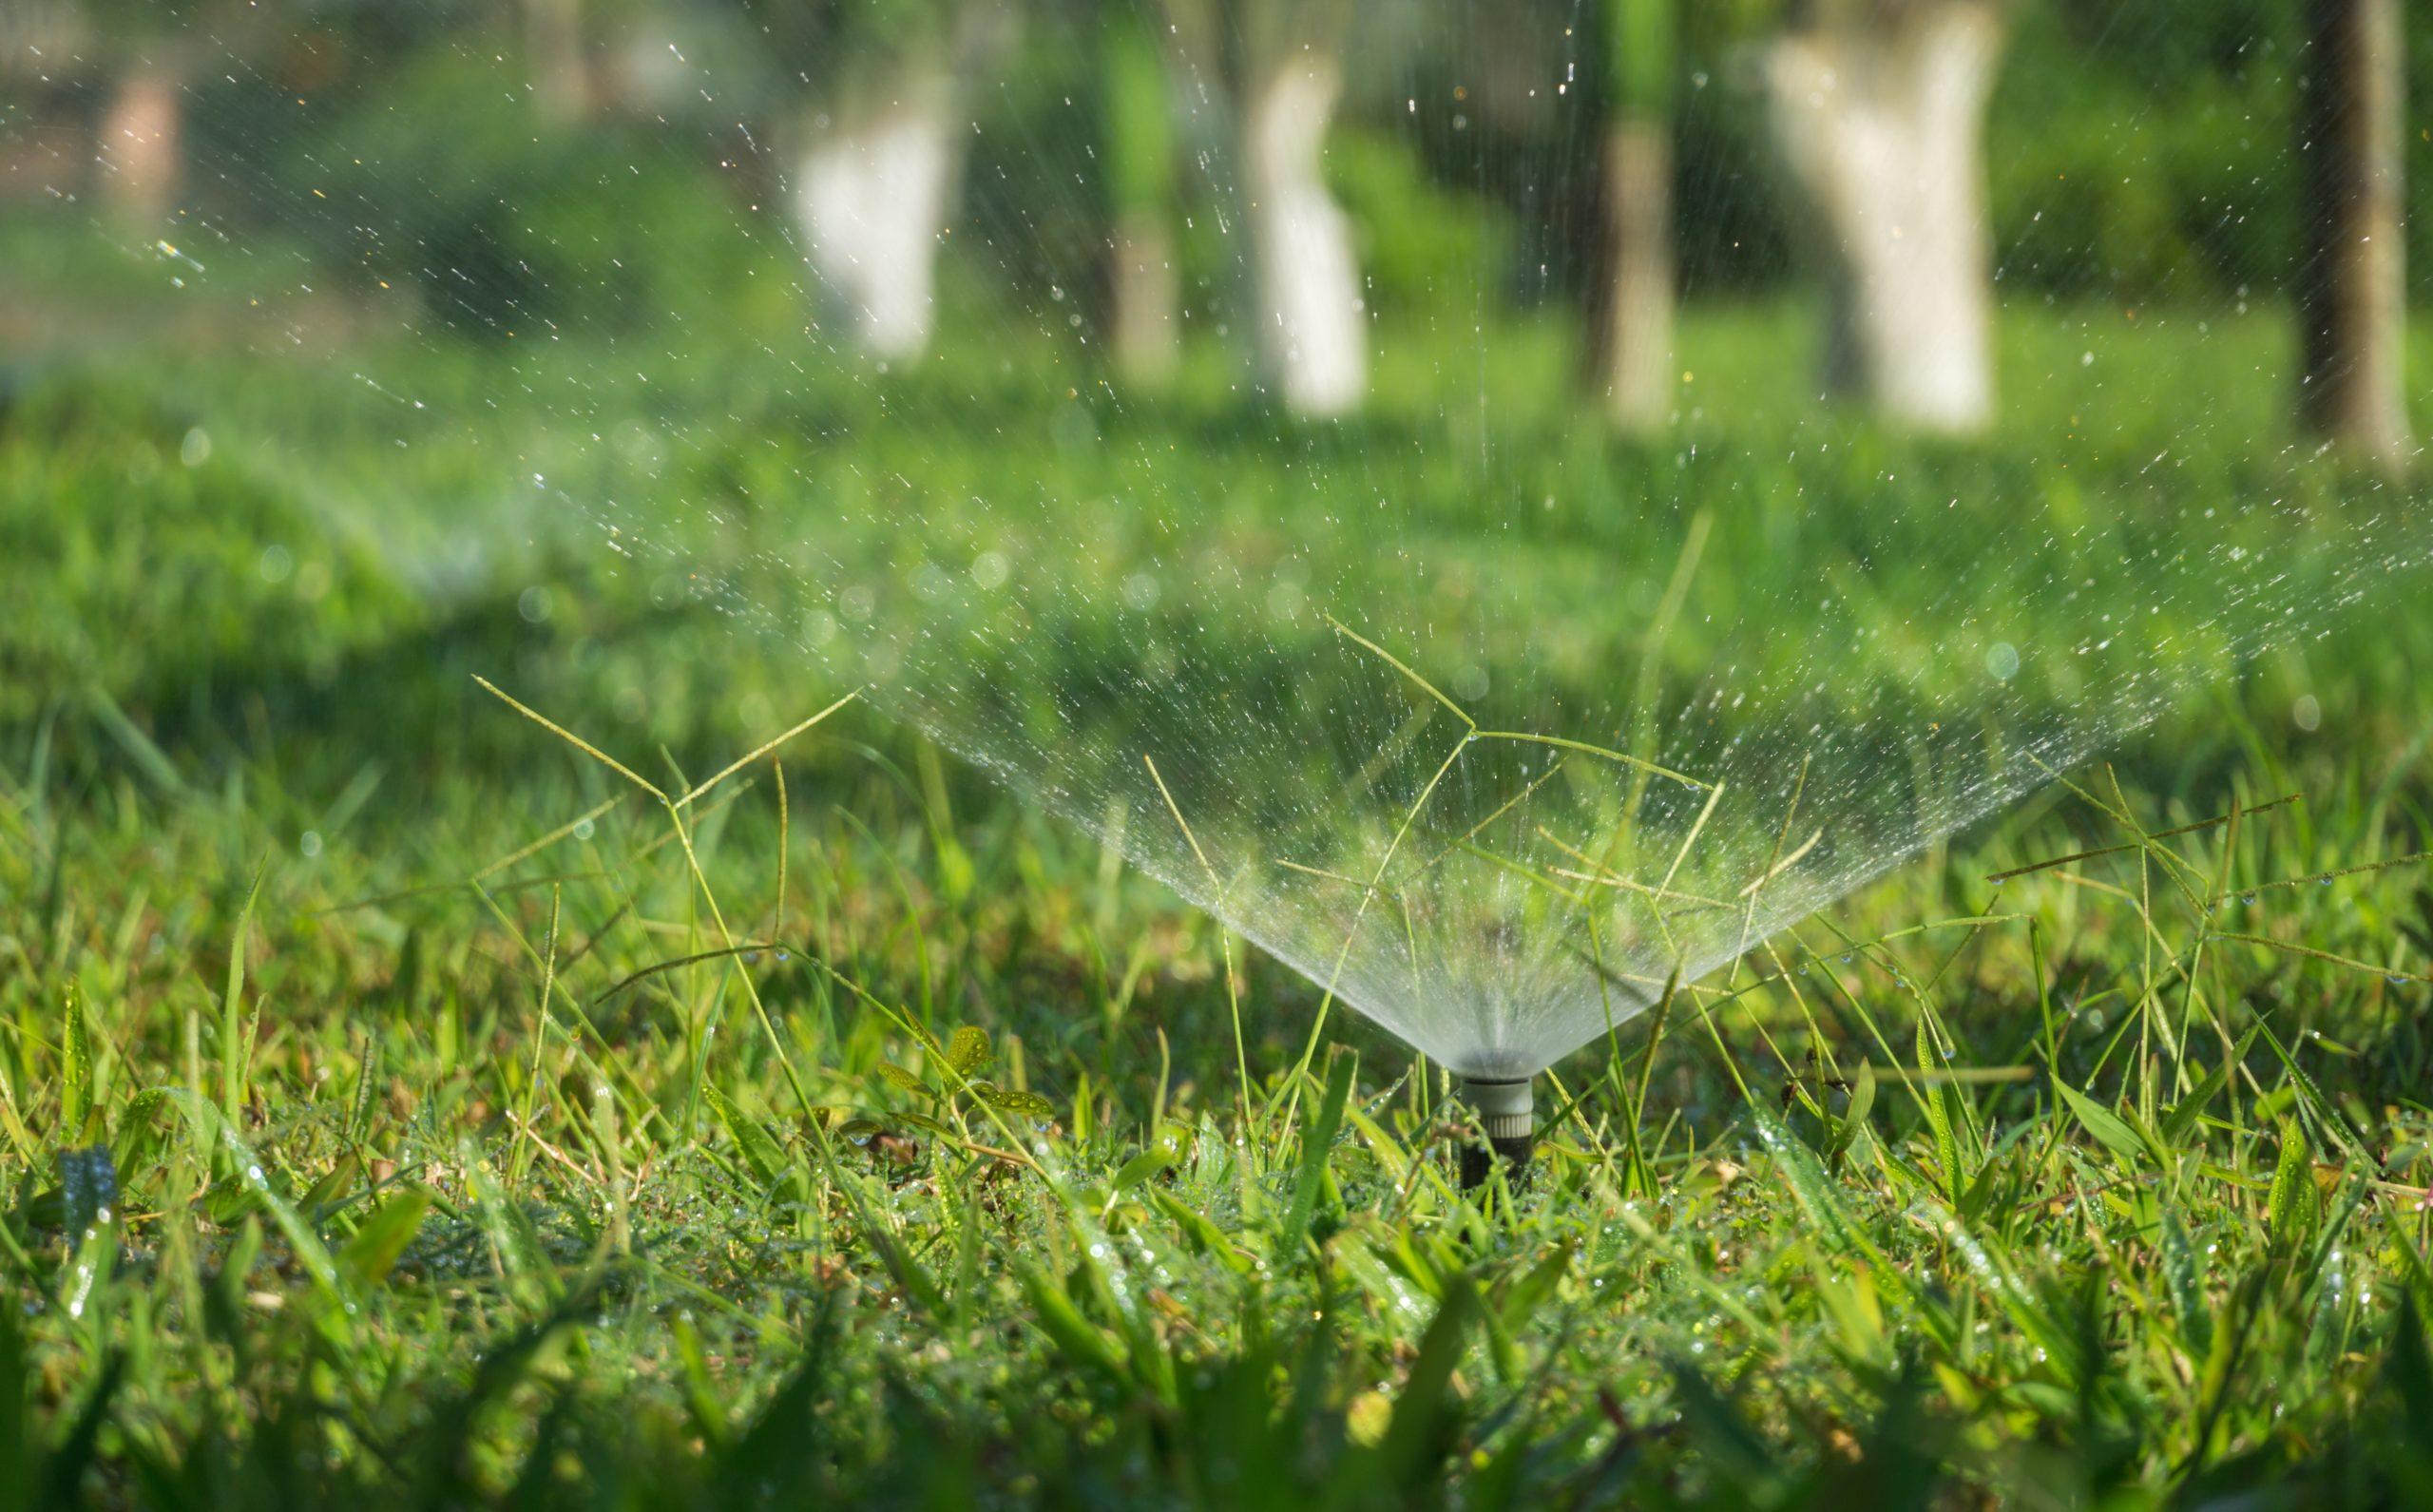 A sprinkler repair success